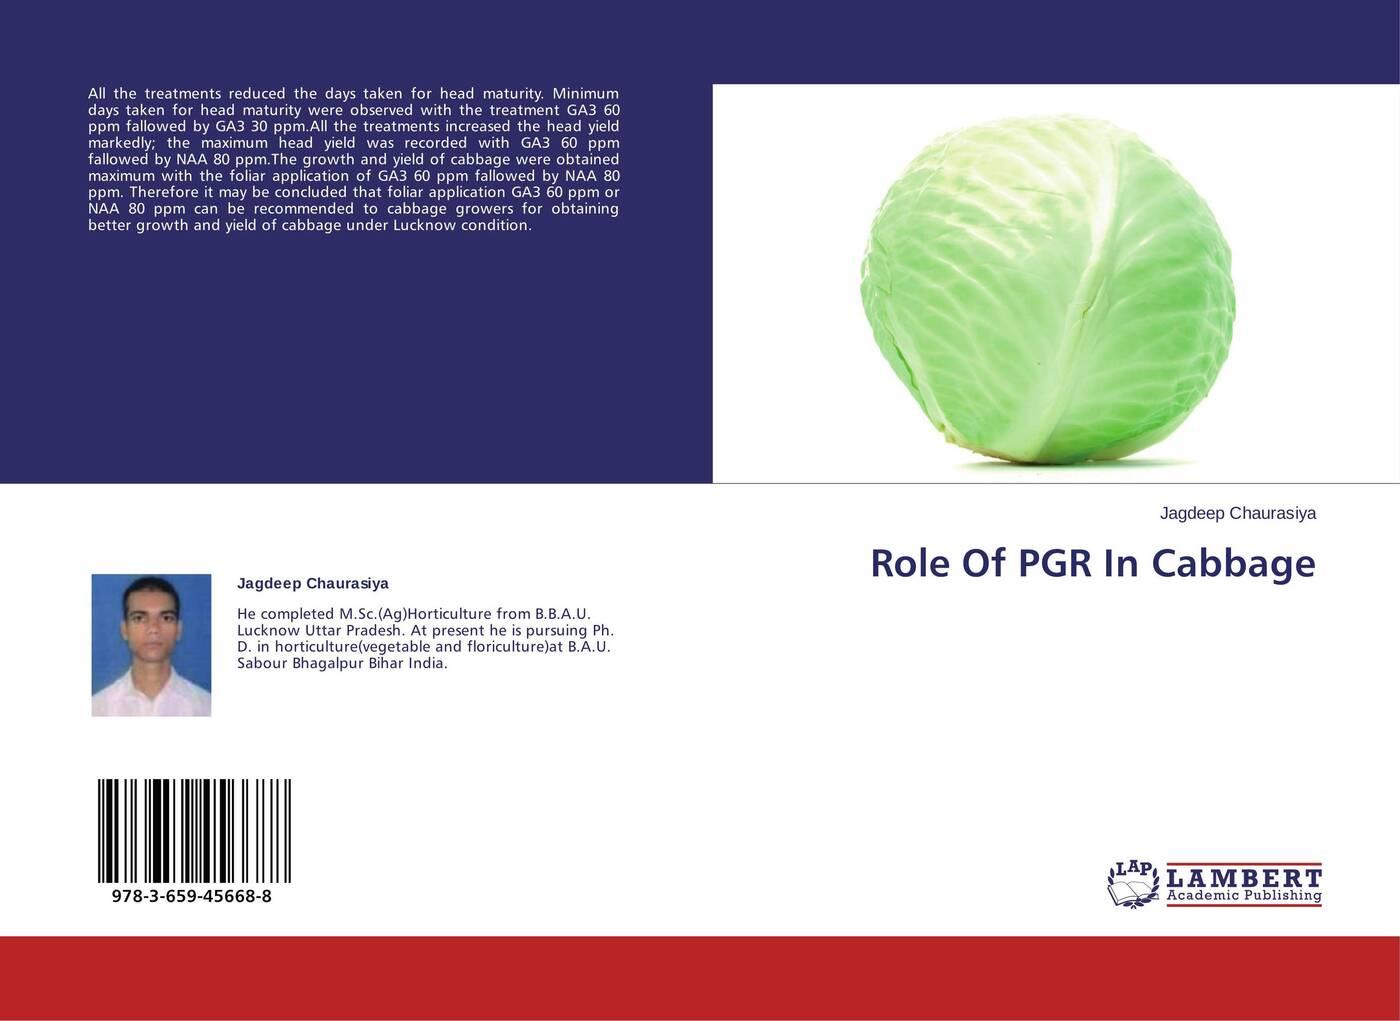 Jagdeep Chaurasiya Role Of PGR In Cabbage ppm для растений